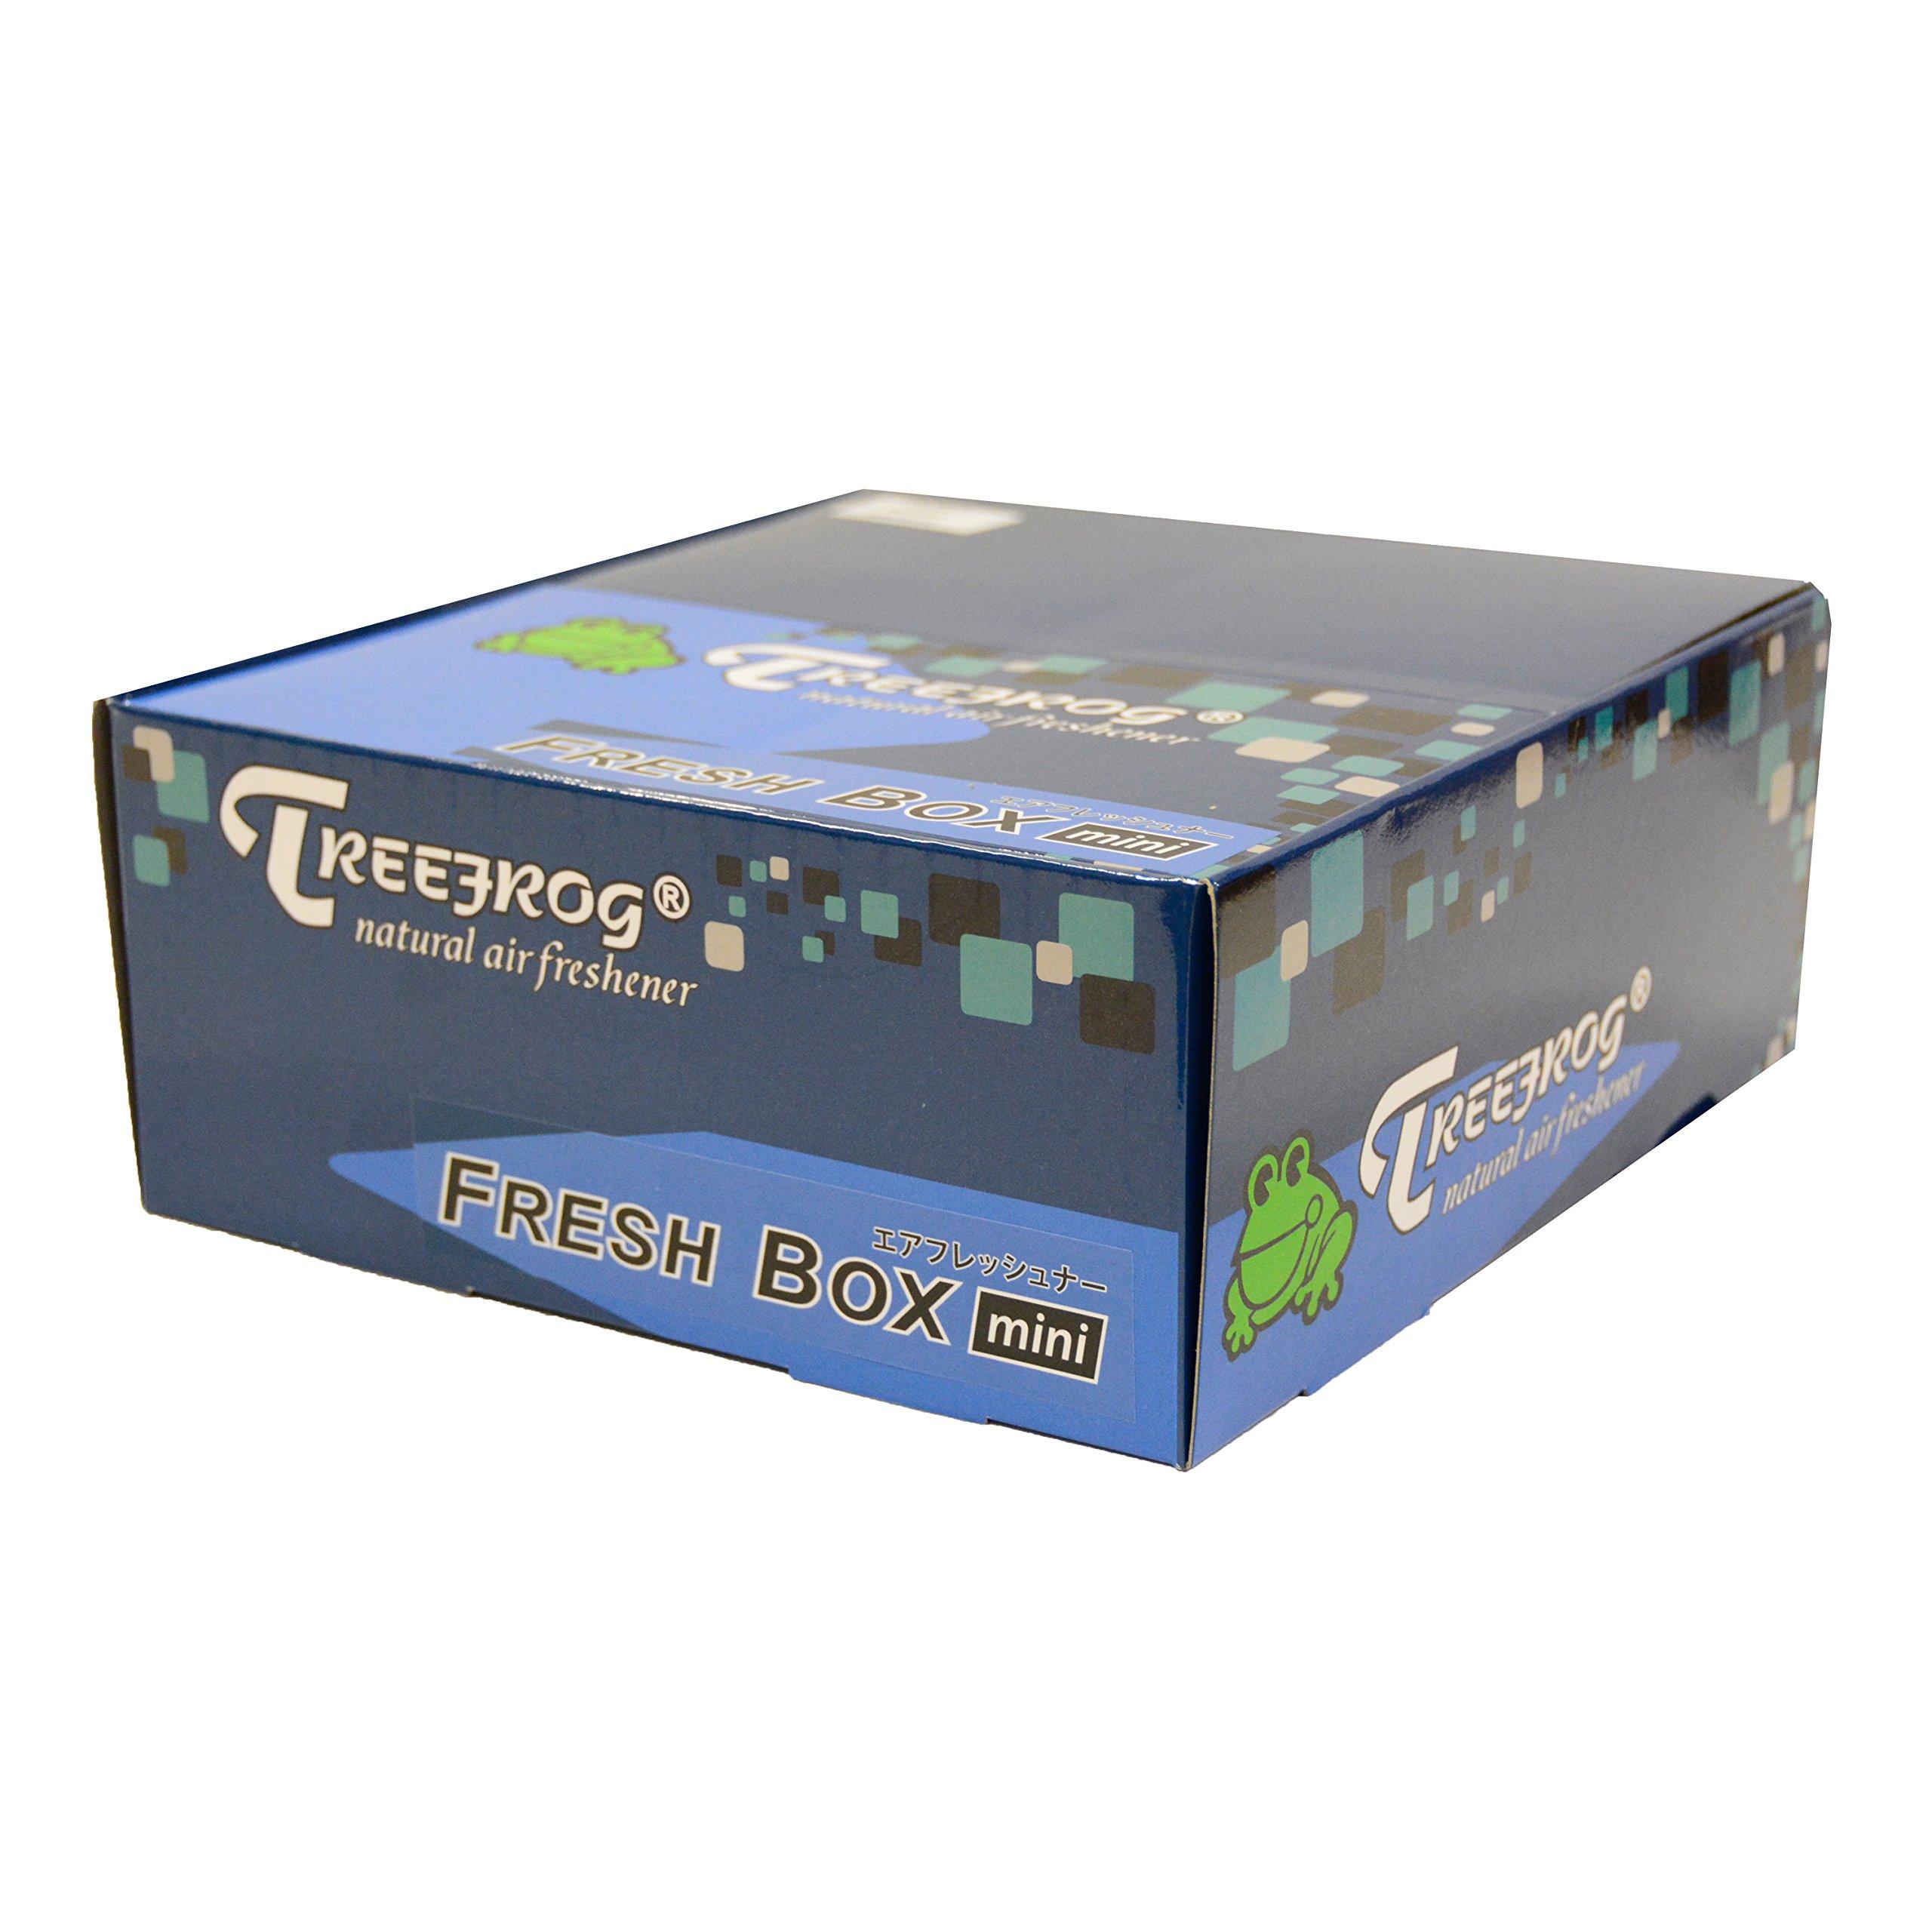 9 Packs TreeFrog FRESH BOX MINI (aka Xtreme Fresh Mini) Lemon Squash Scent Premium JDM Air Freshener by Treefrog Fresh Box Mini (Image #5)